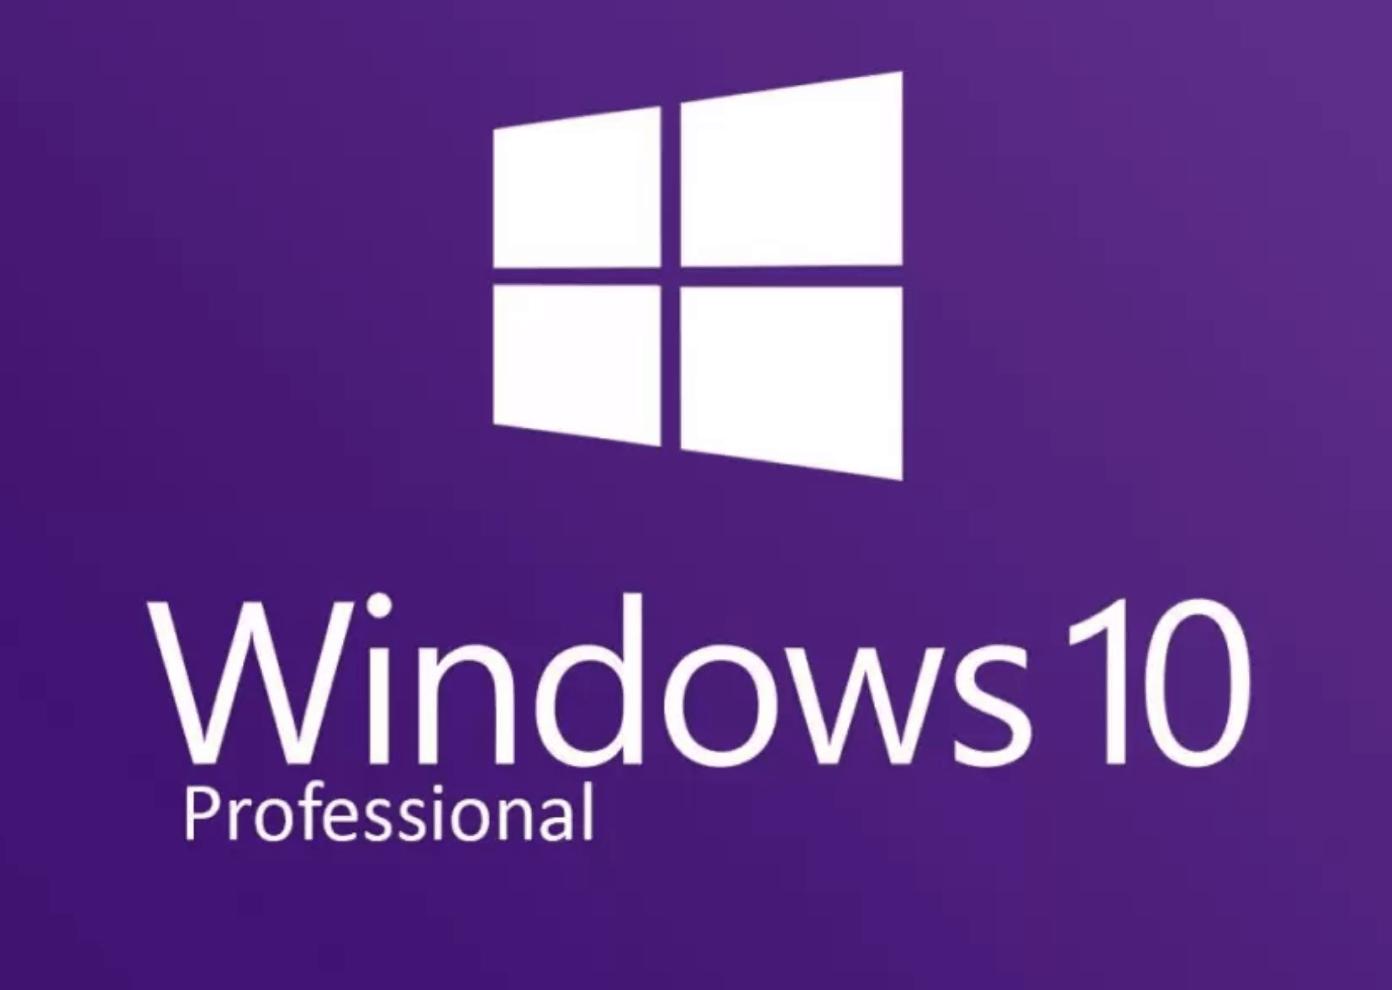 Autumn Sale: Windows 10 Pro OEM CDKey Marked Down to Under $12